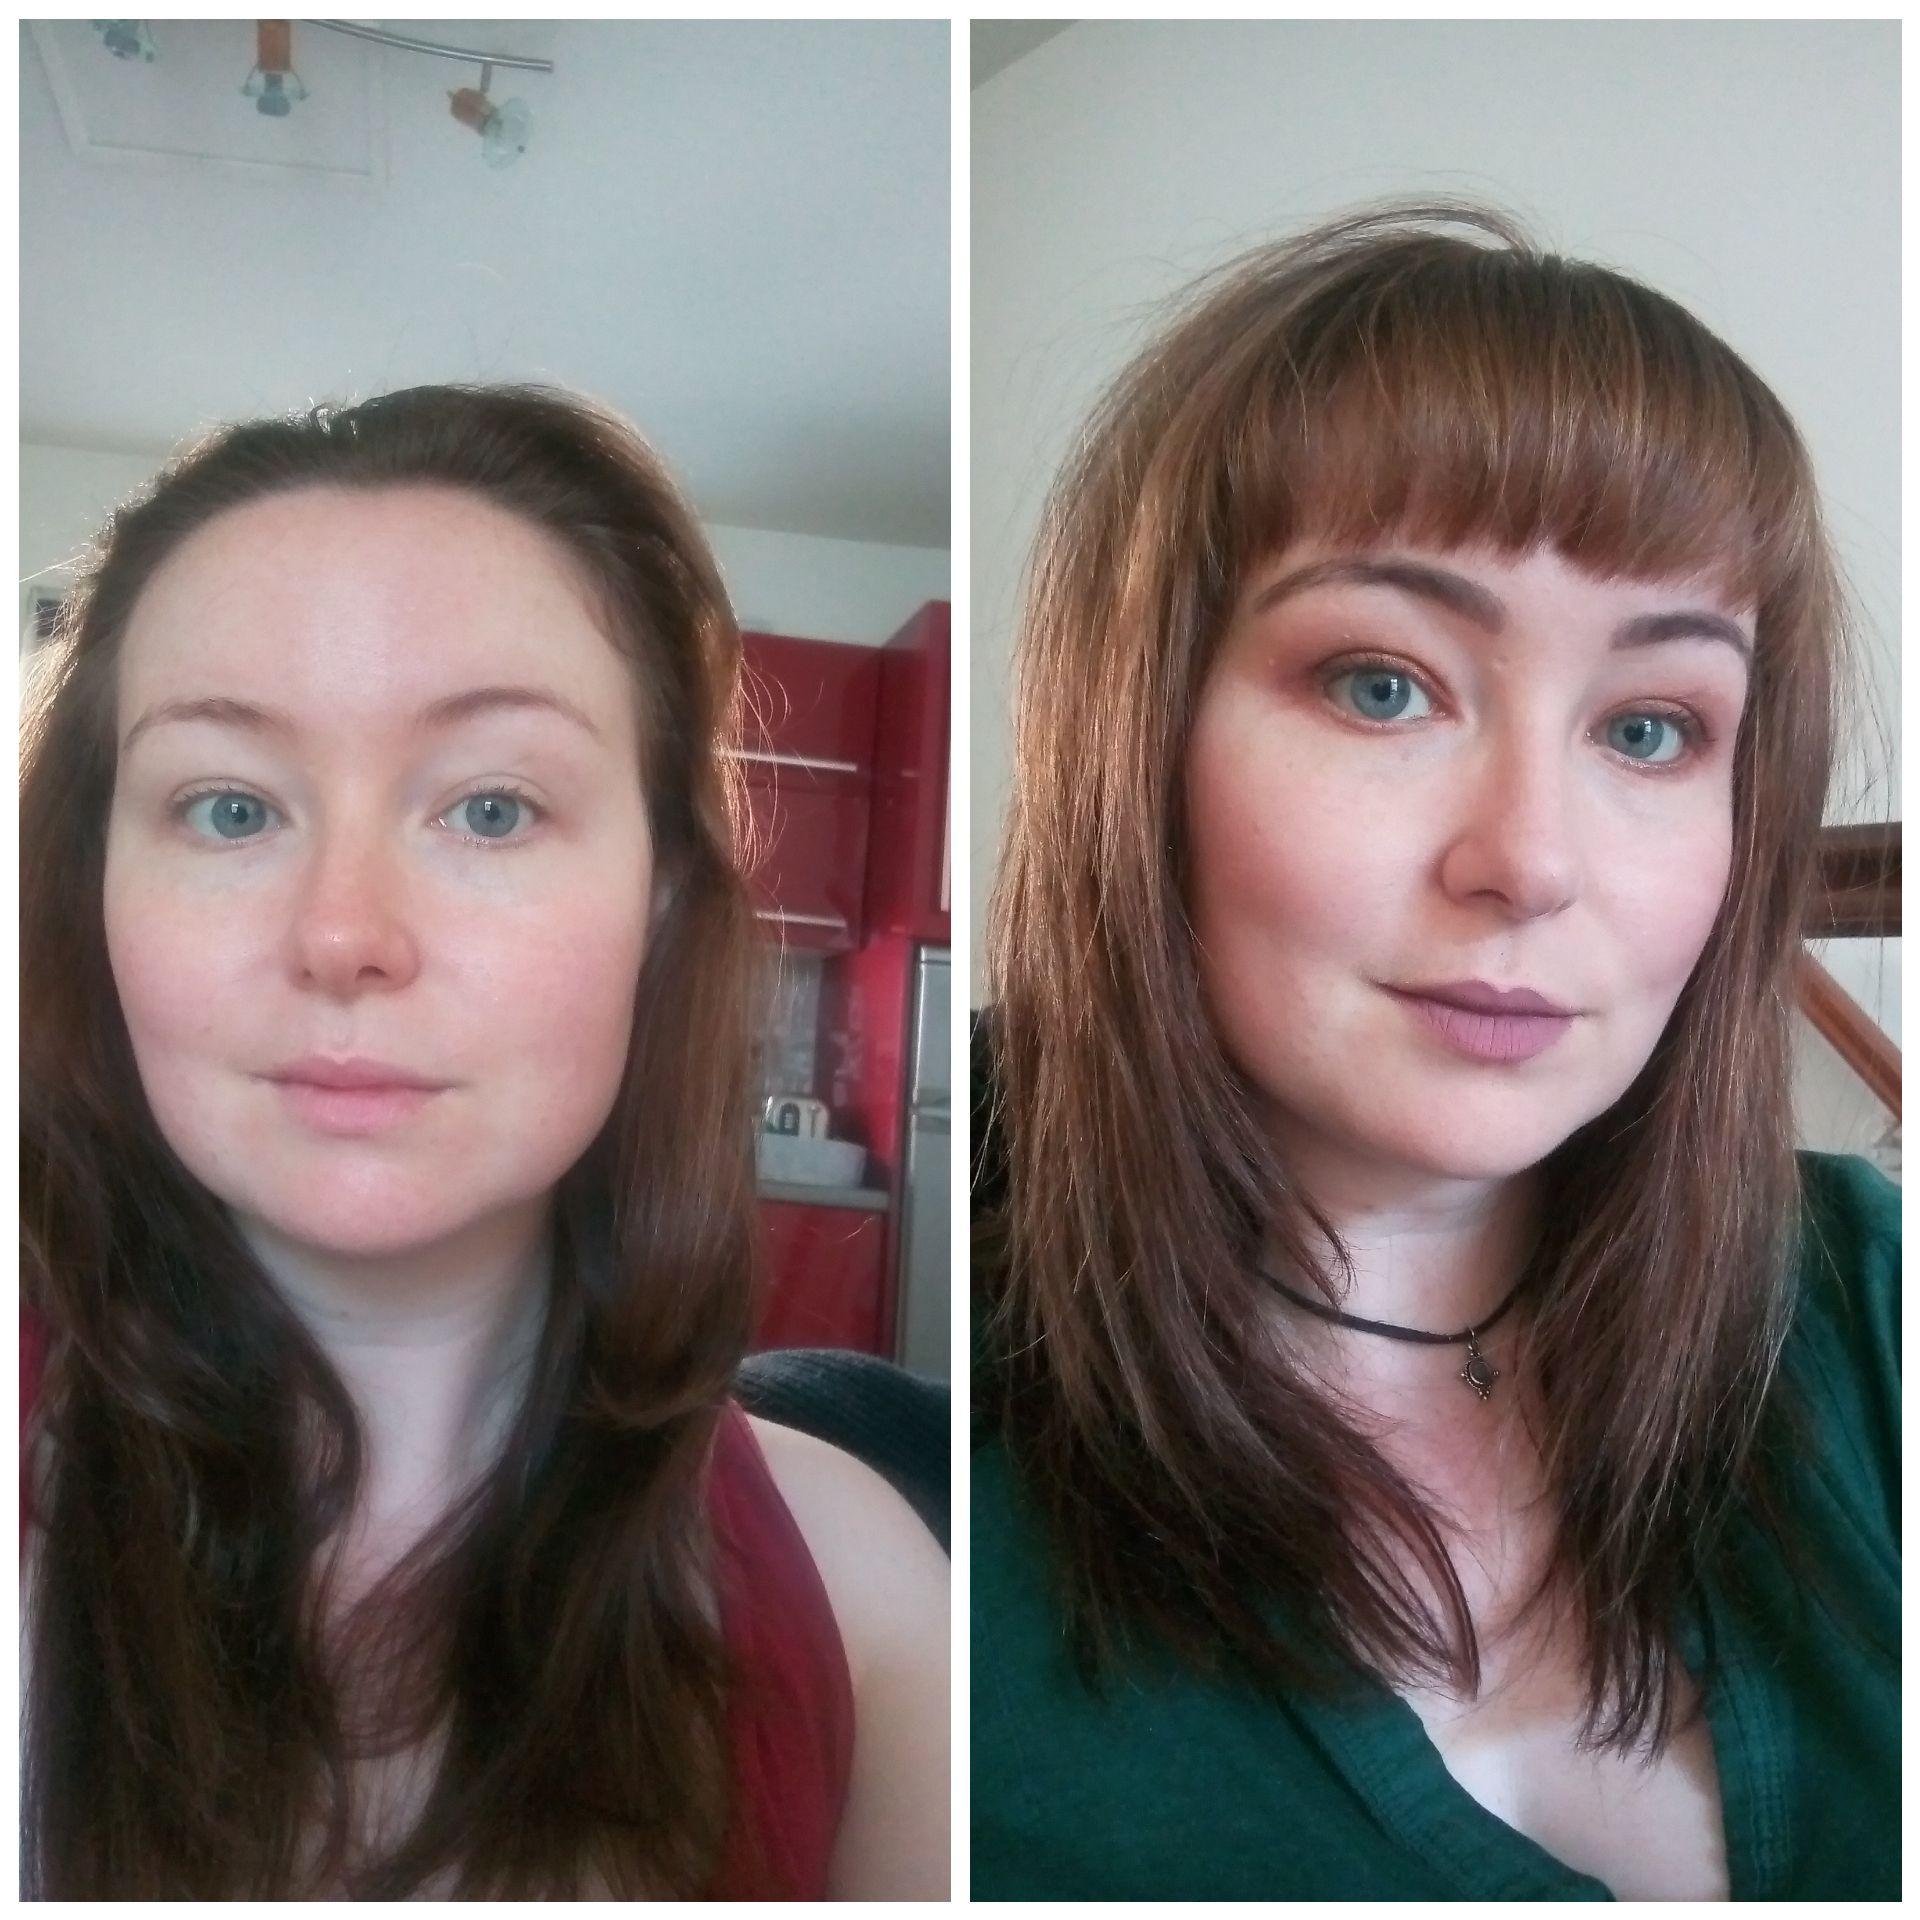 New Hair Done By Chair In Cork Ireland Hair Beauty Skin Deals Me Fashion Love Cute Style Women Makeup New Hair New Hair Do Hair